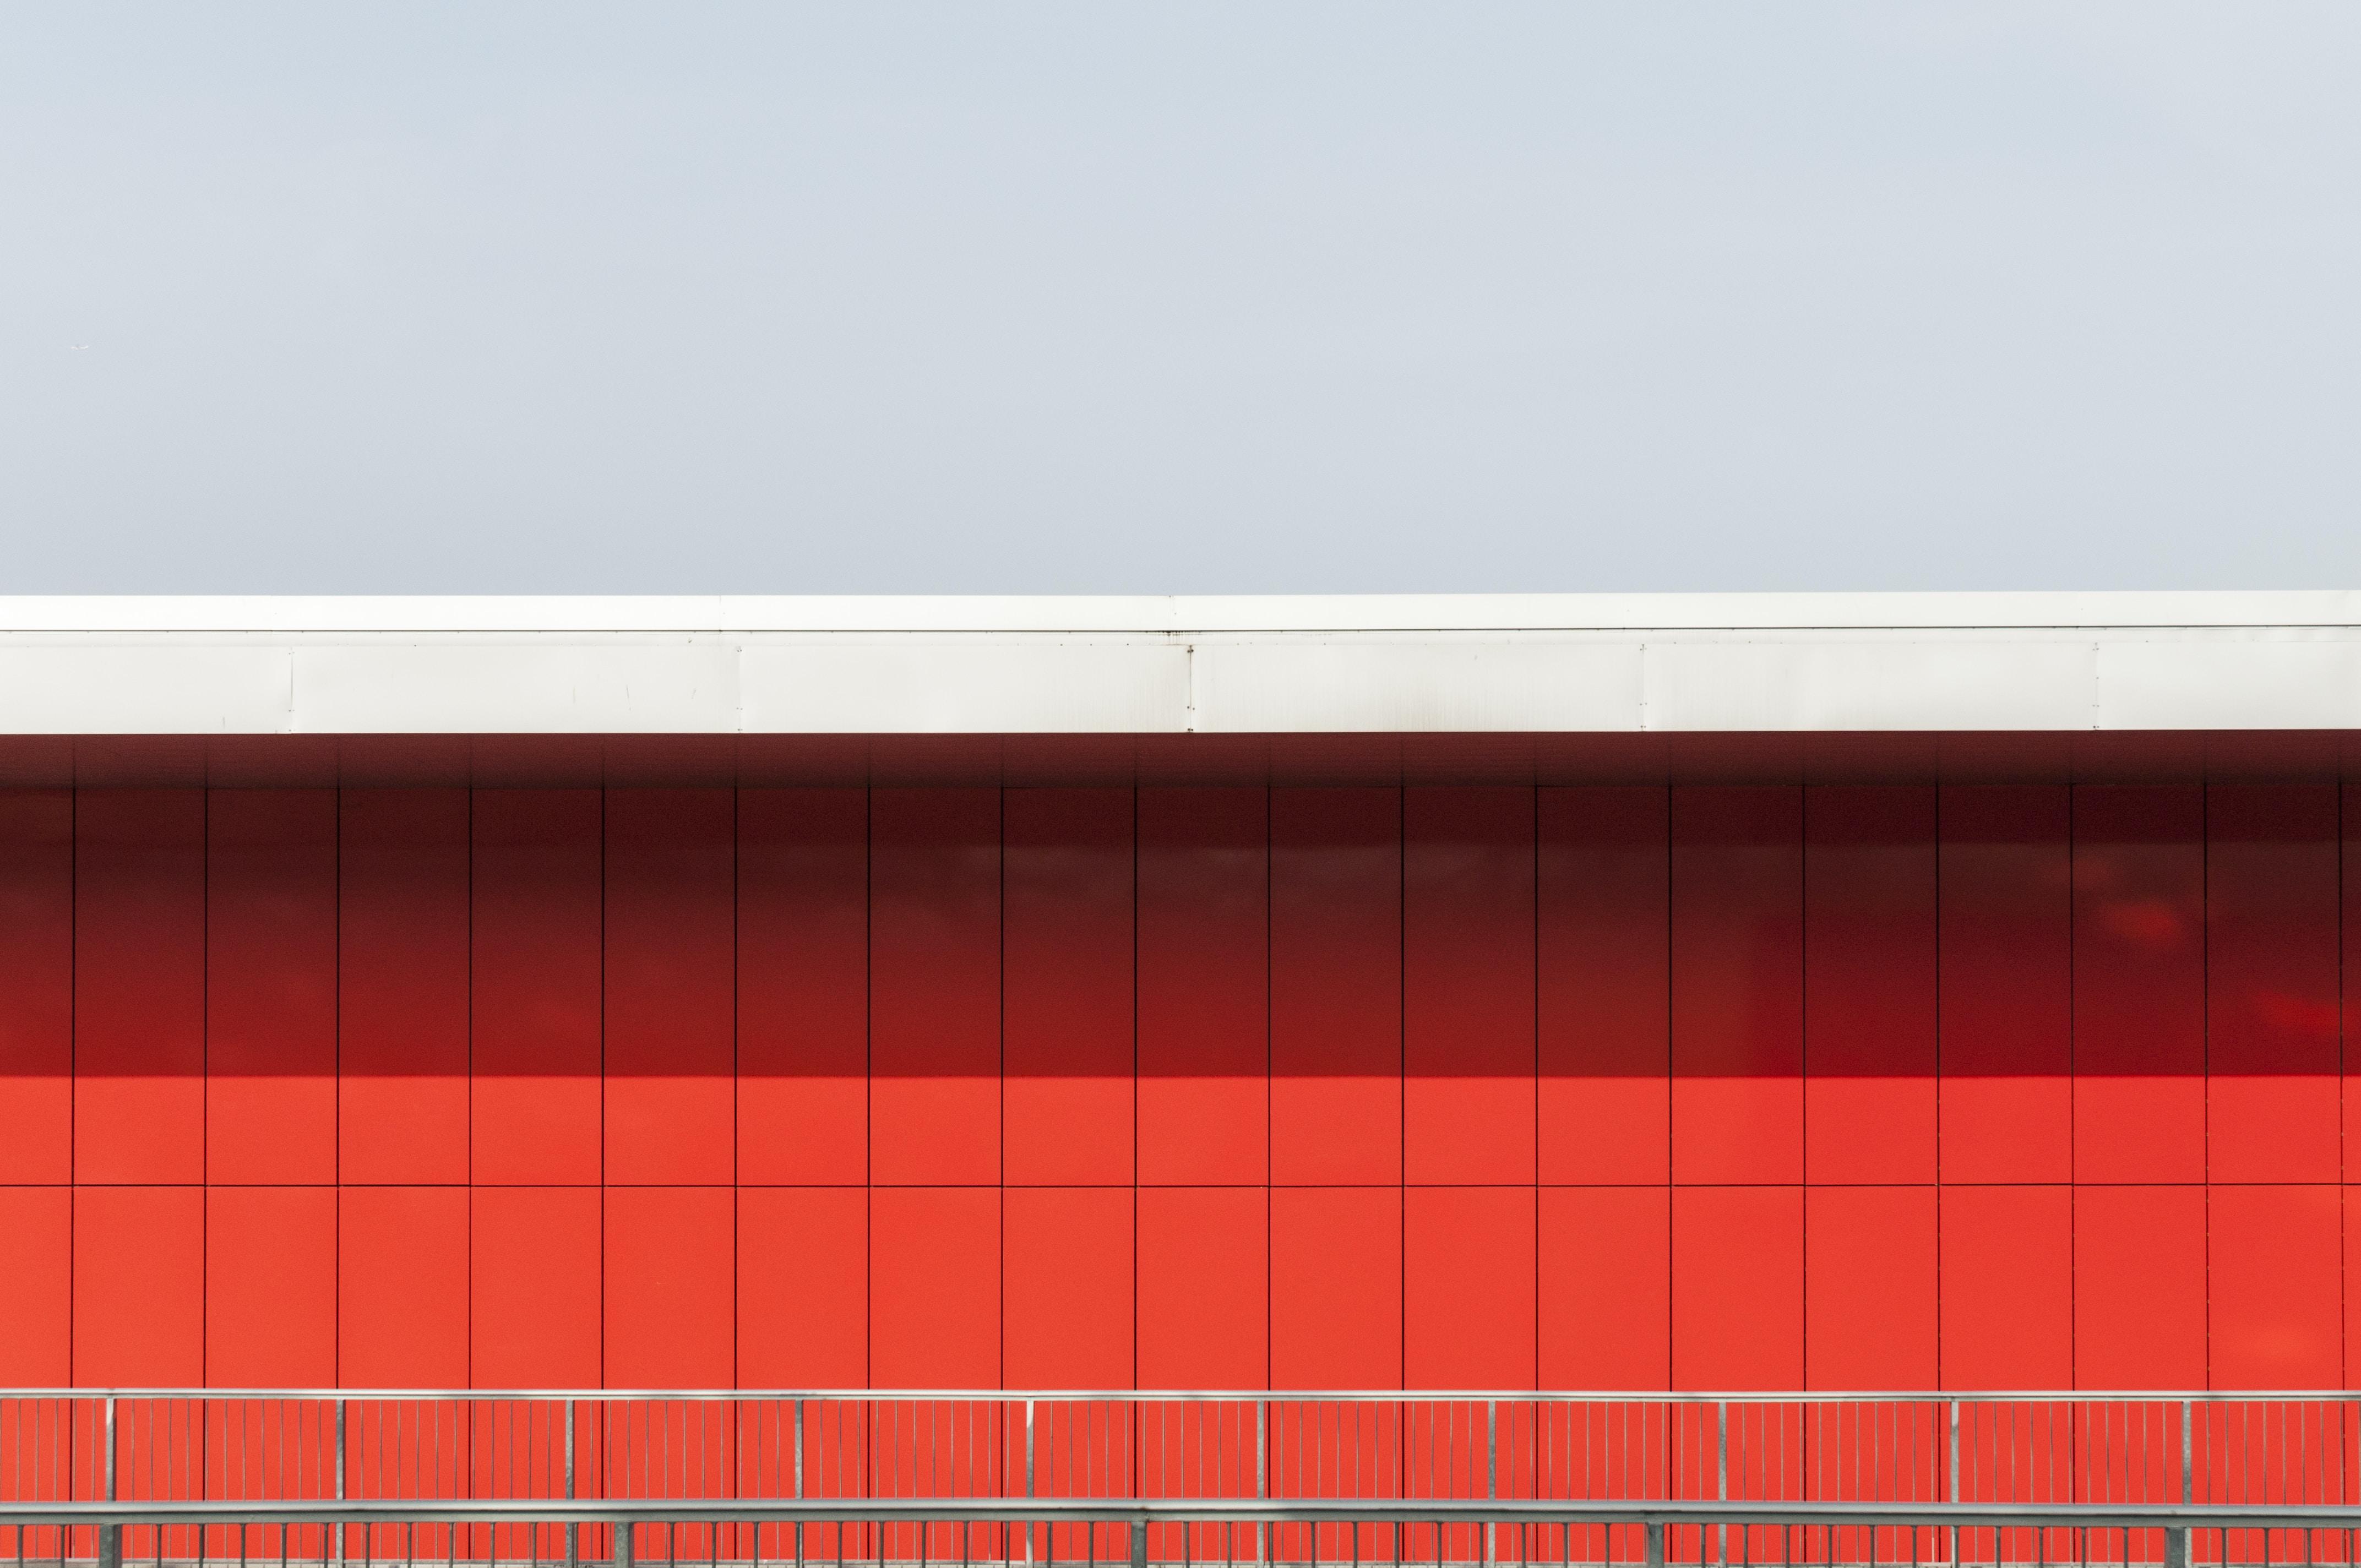 grey steel railing outdoors